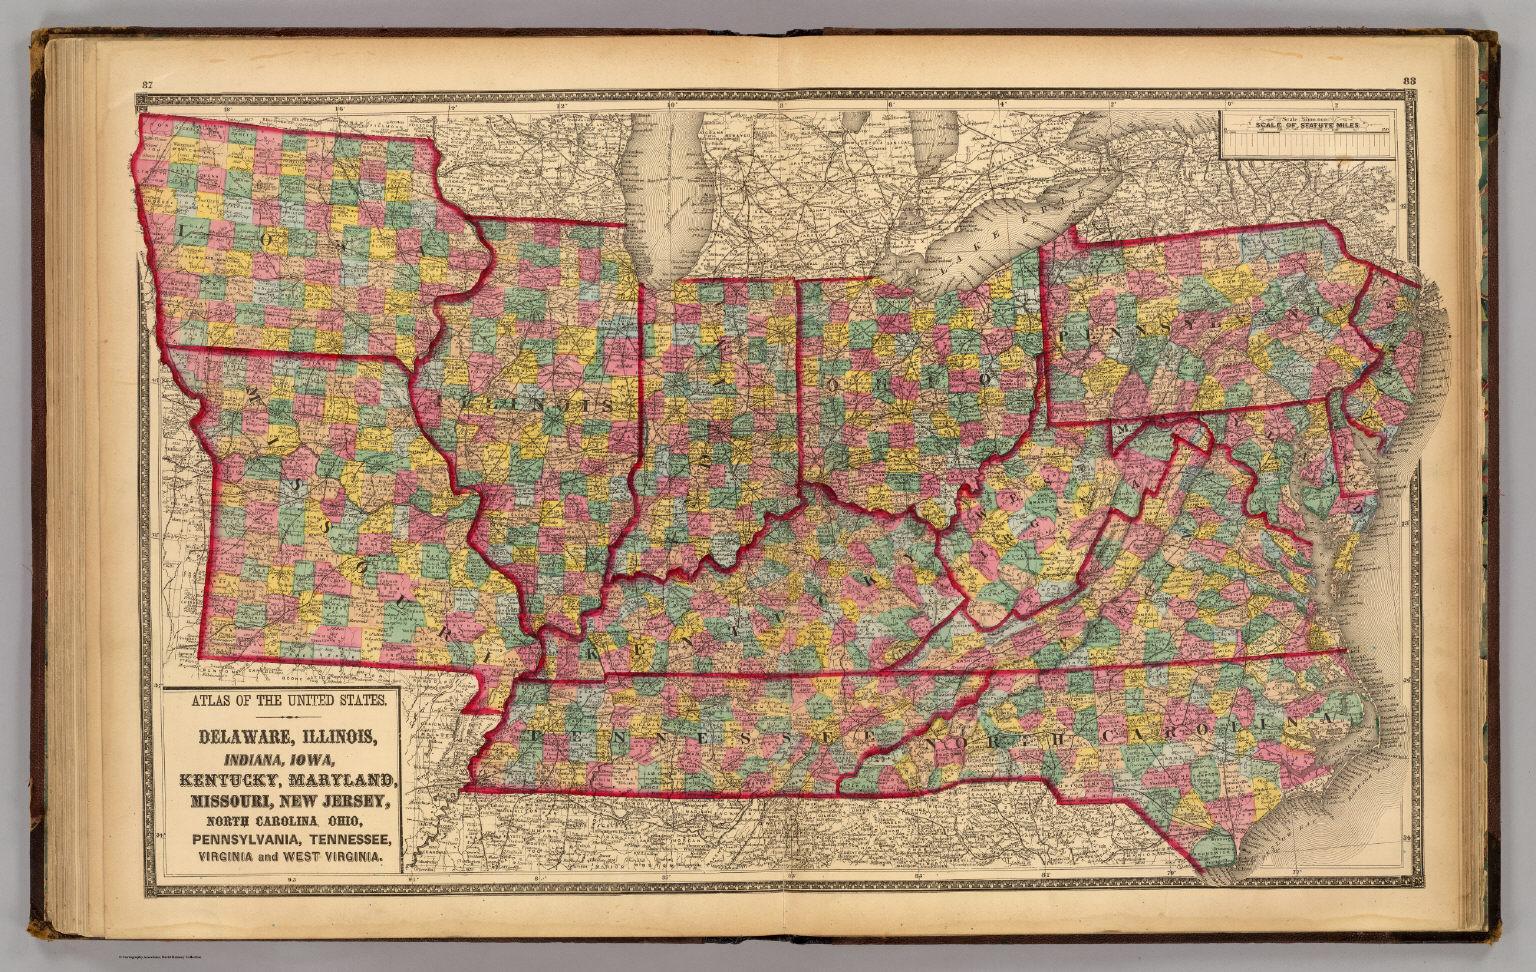 Map Of Ohio West Virginia And Pennsylvania.Delaware Illinois Indiana Iowa North Carolina Tennessee